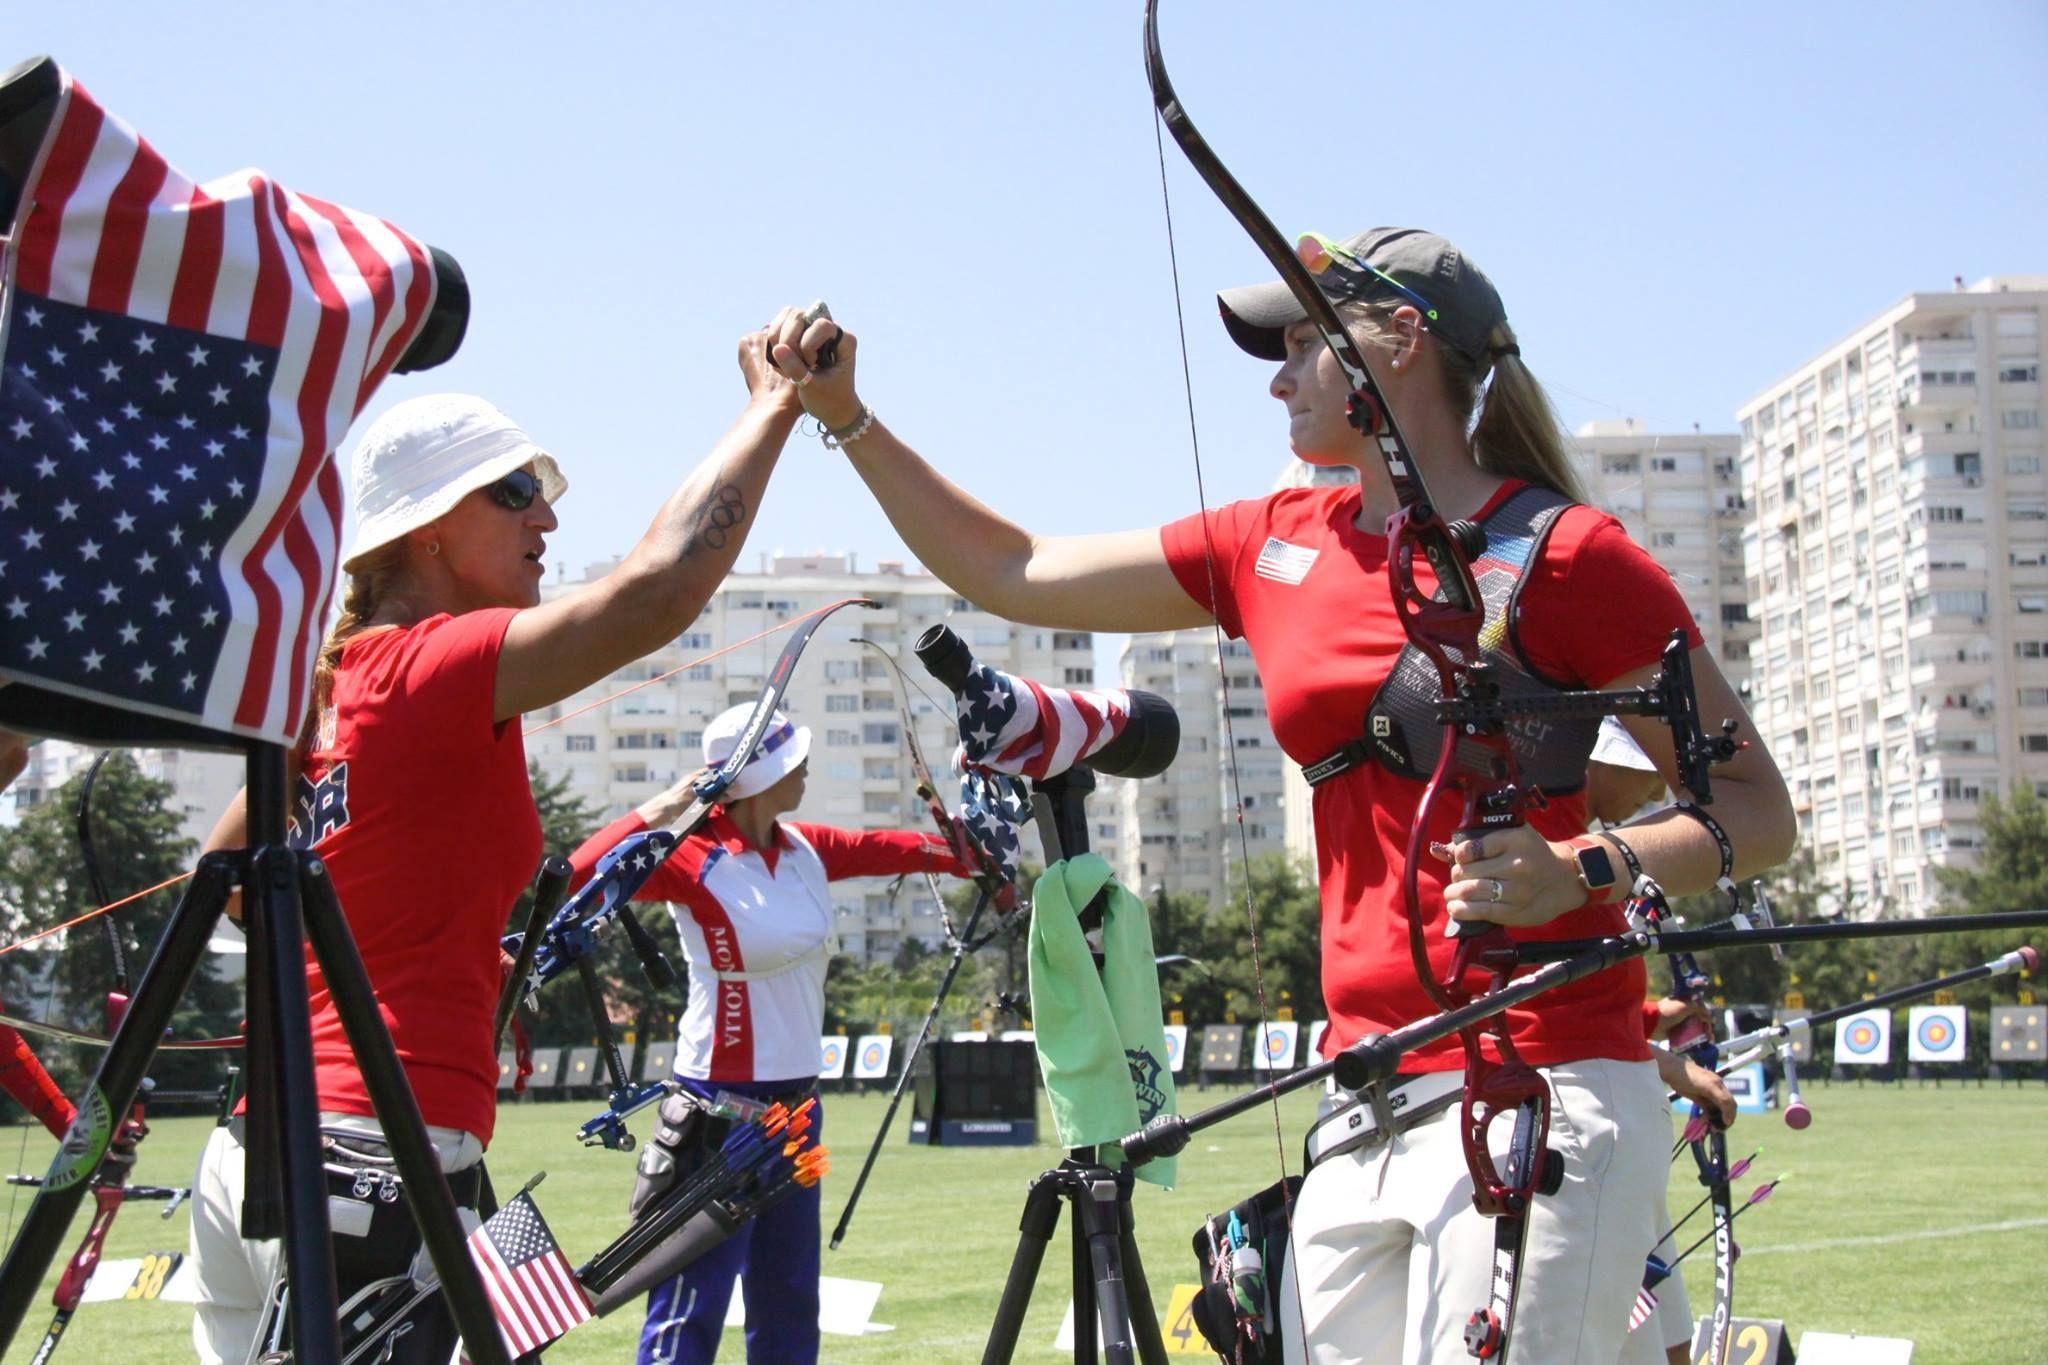 Pin by MARK WHARTON on Archers   Olympic archery, Archery